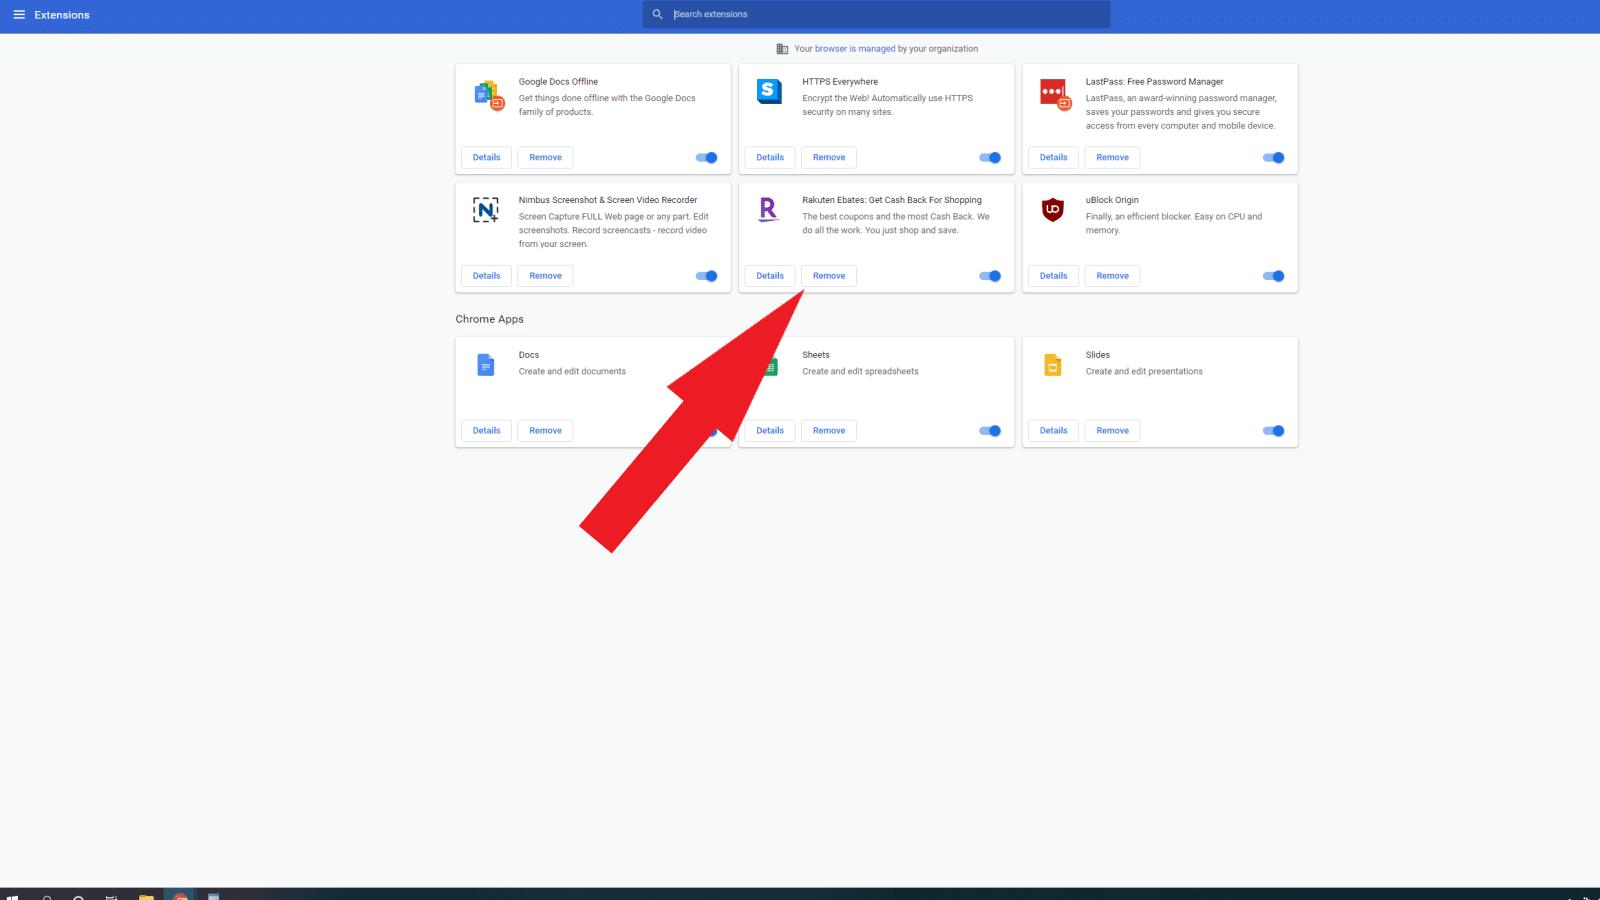 google chrome extensions menu